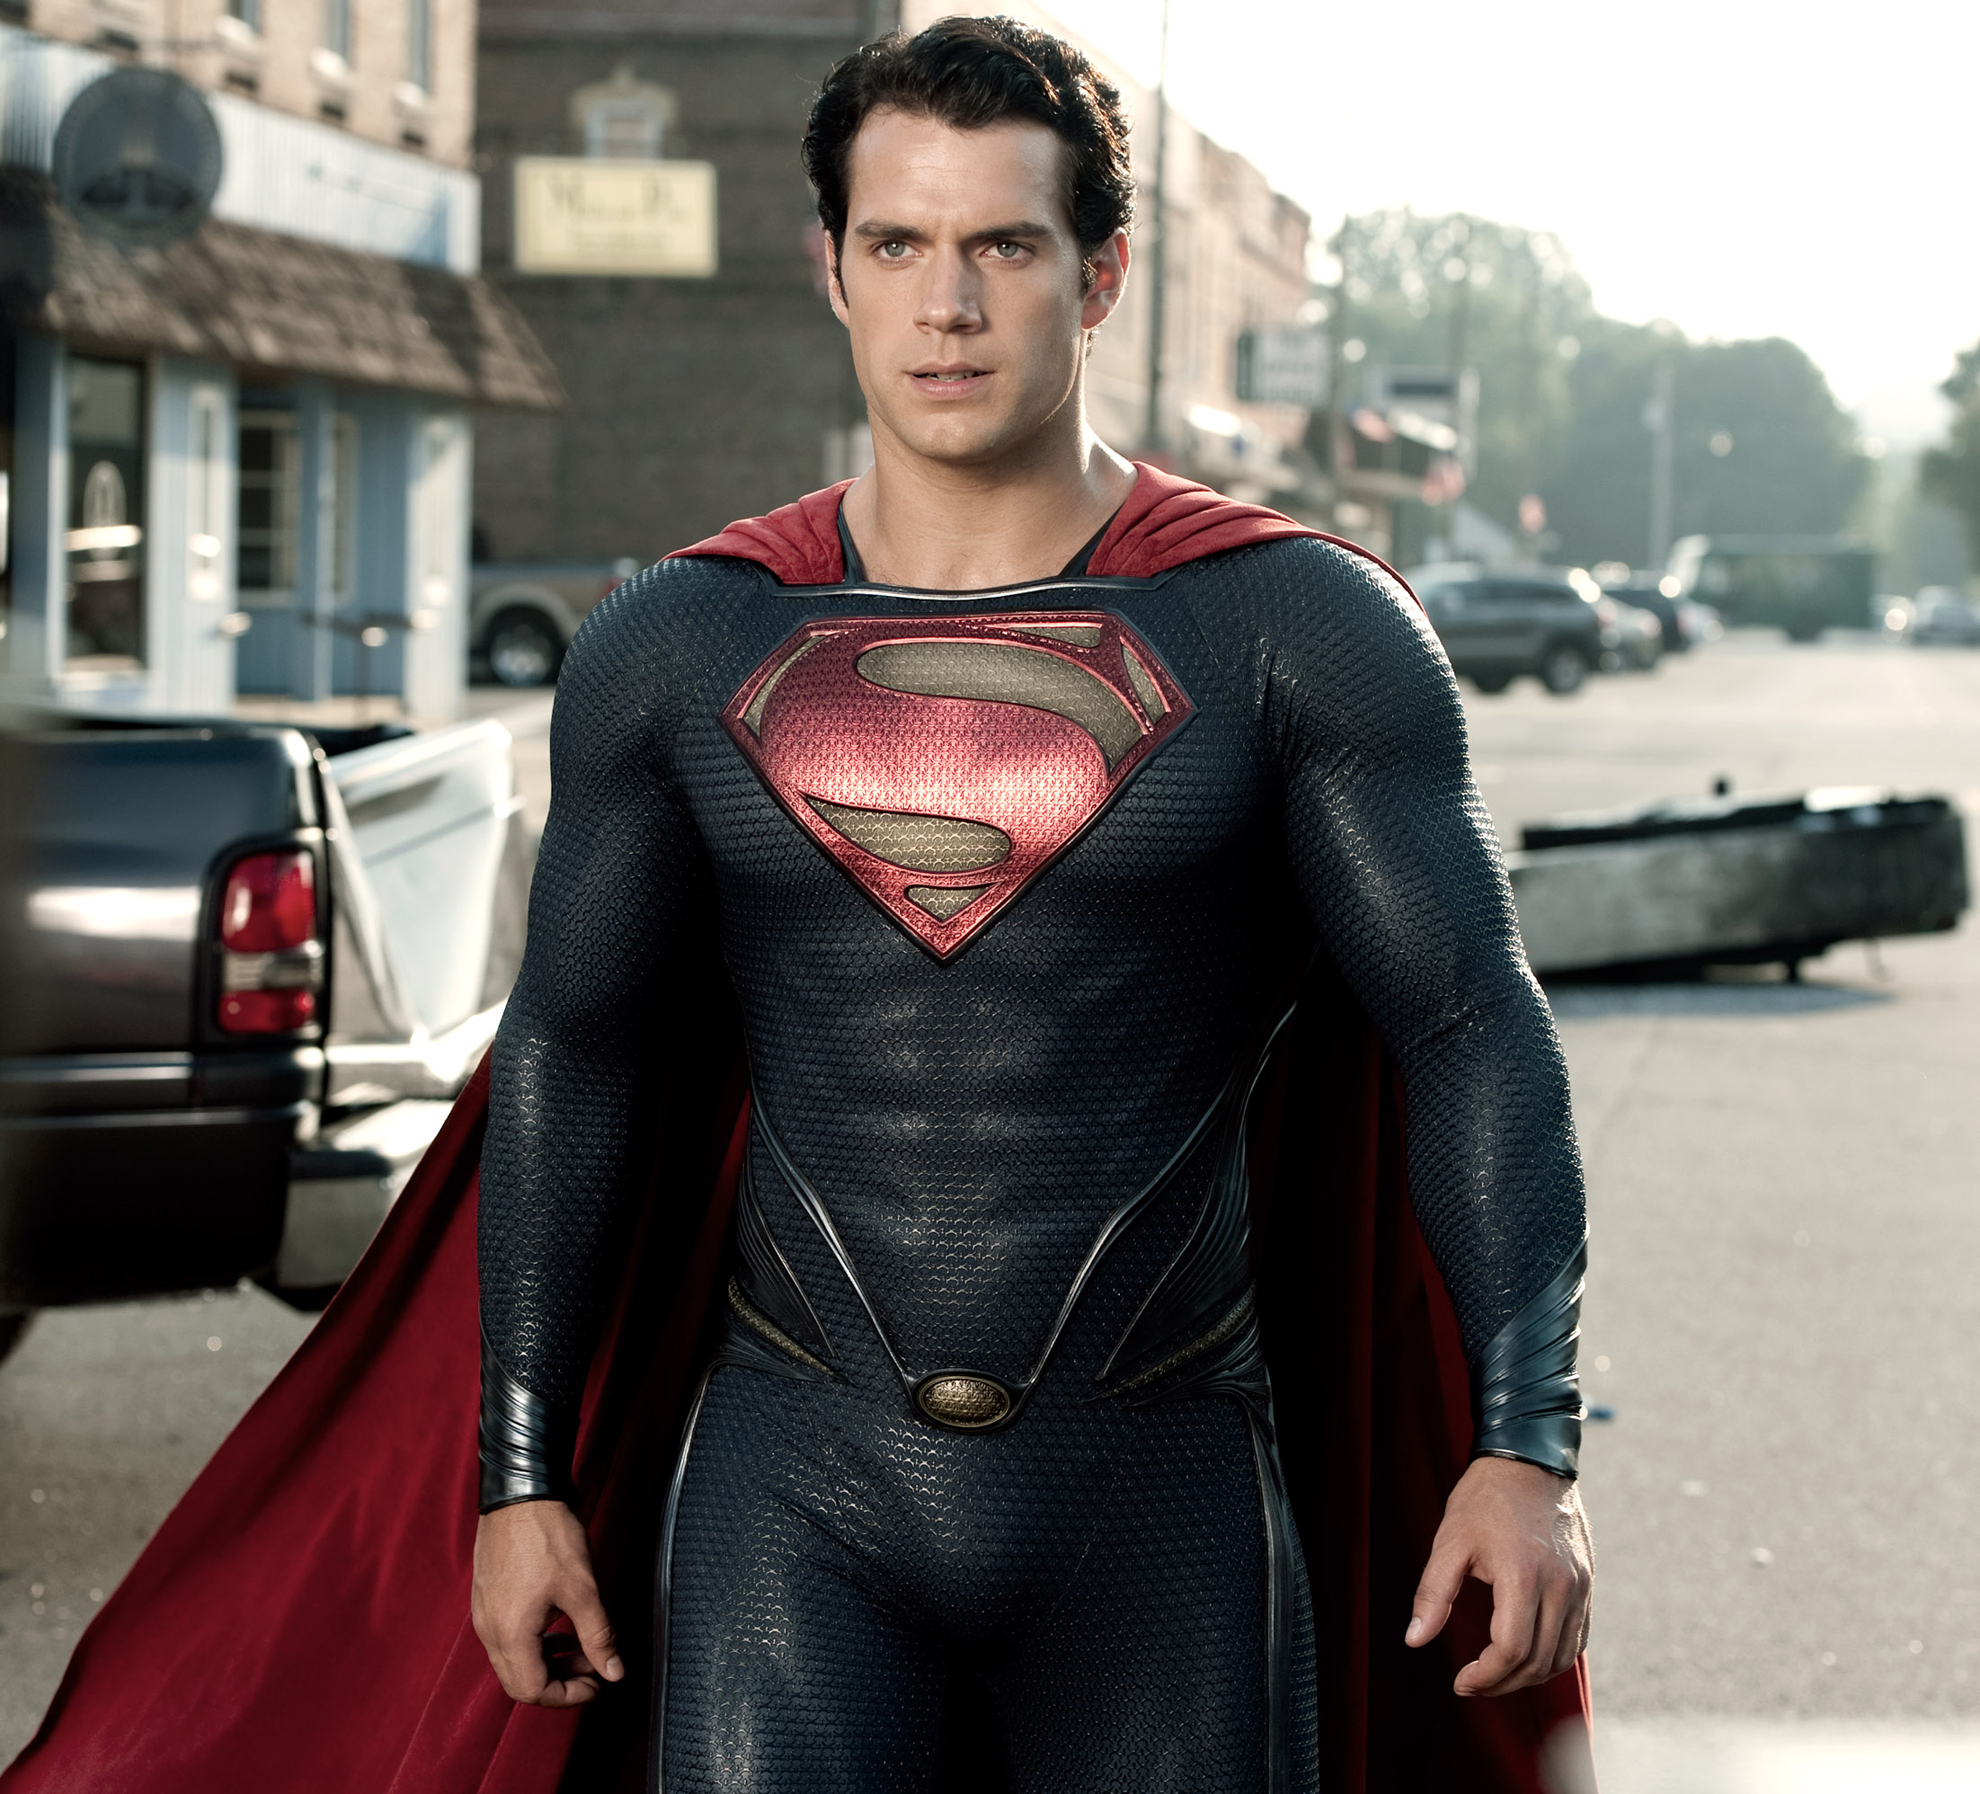 http://vignette3.wikia.nocookie.net/newdcmovieuniverse/images/5/55/Man-of-Steel-Superman-Suit.jpg/revision/latest?cb=20141214043433